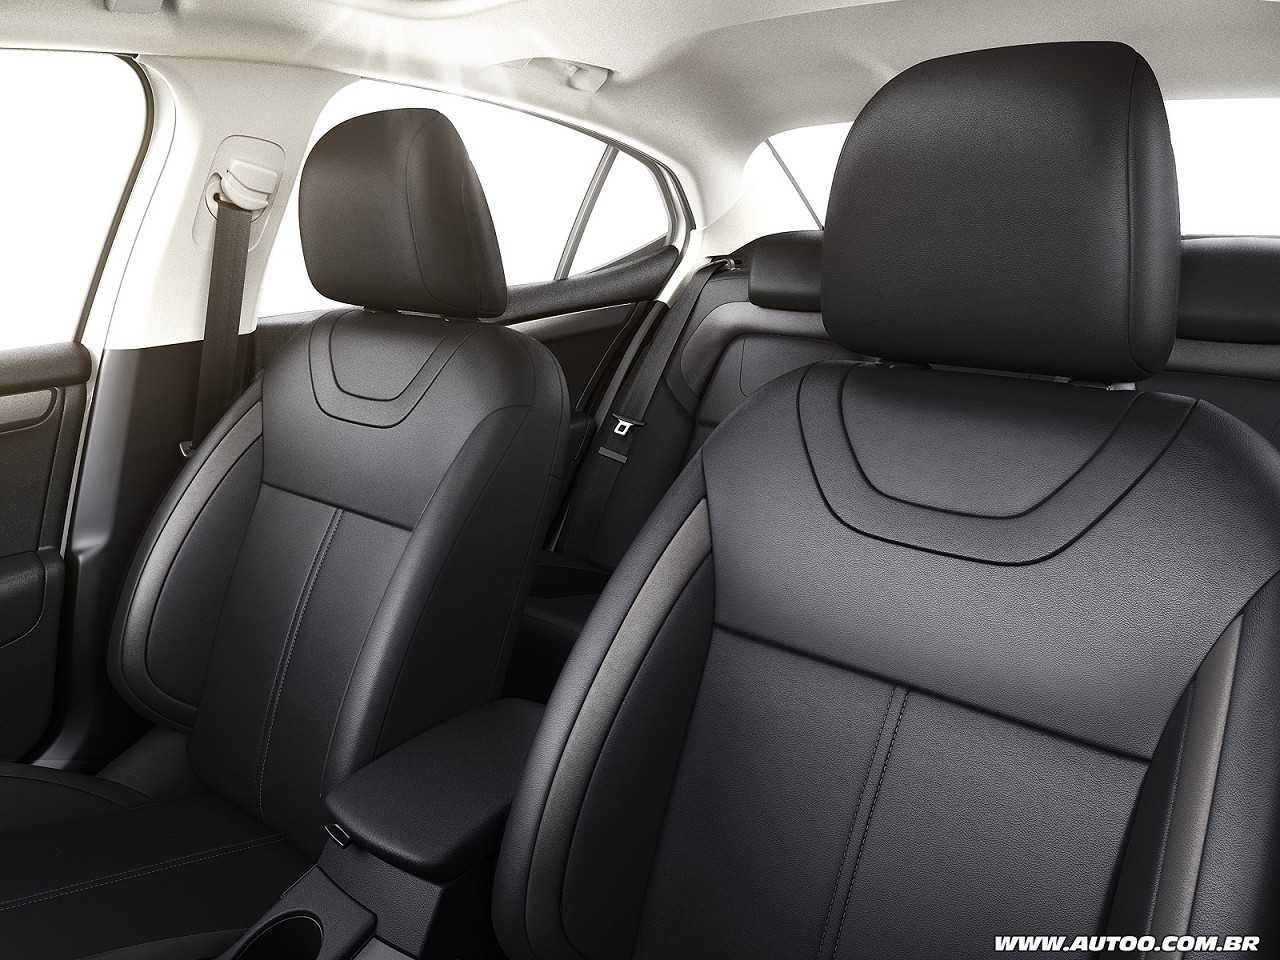 CitroënC4 Lounge 2019 - bancos dianteiros